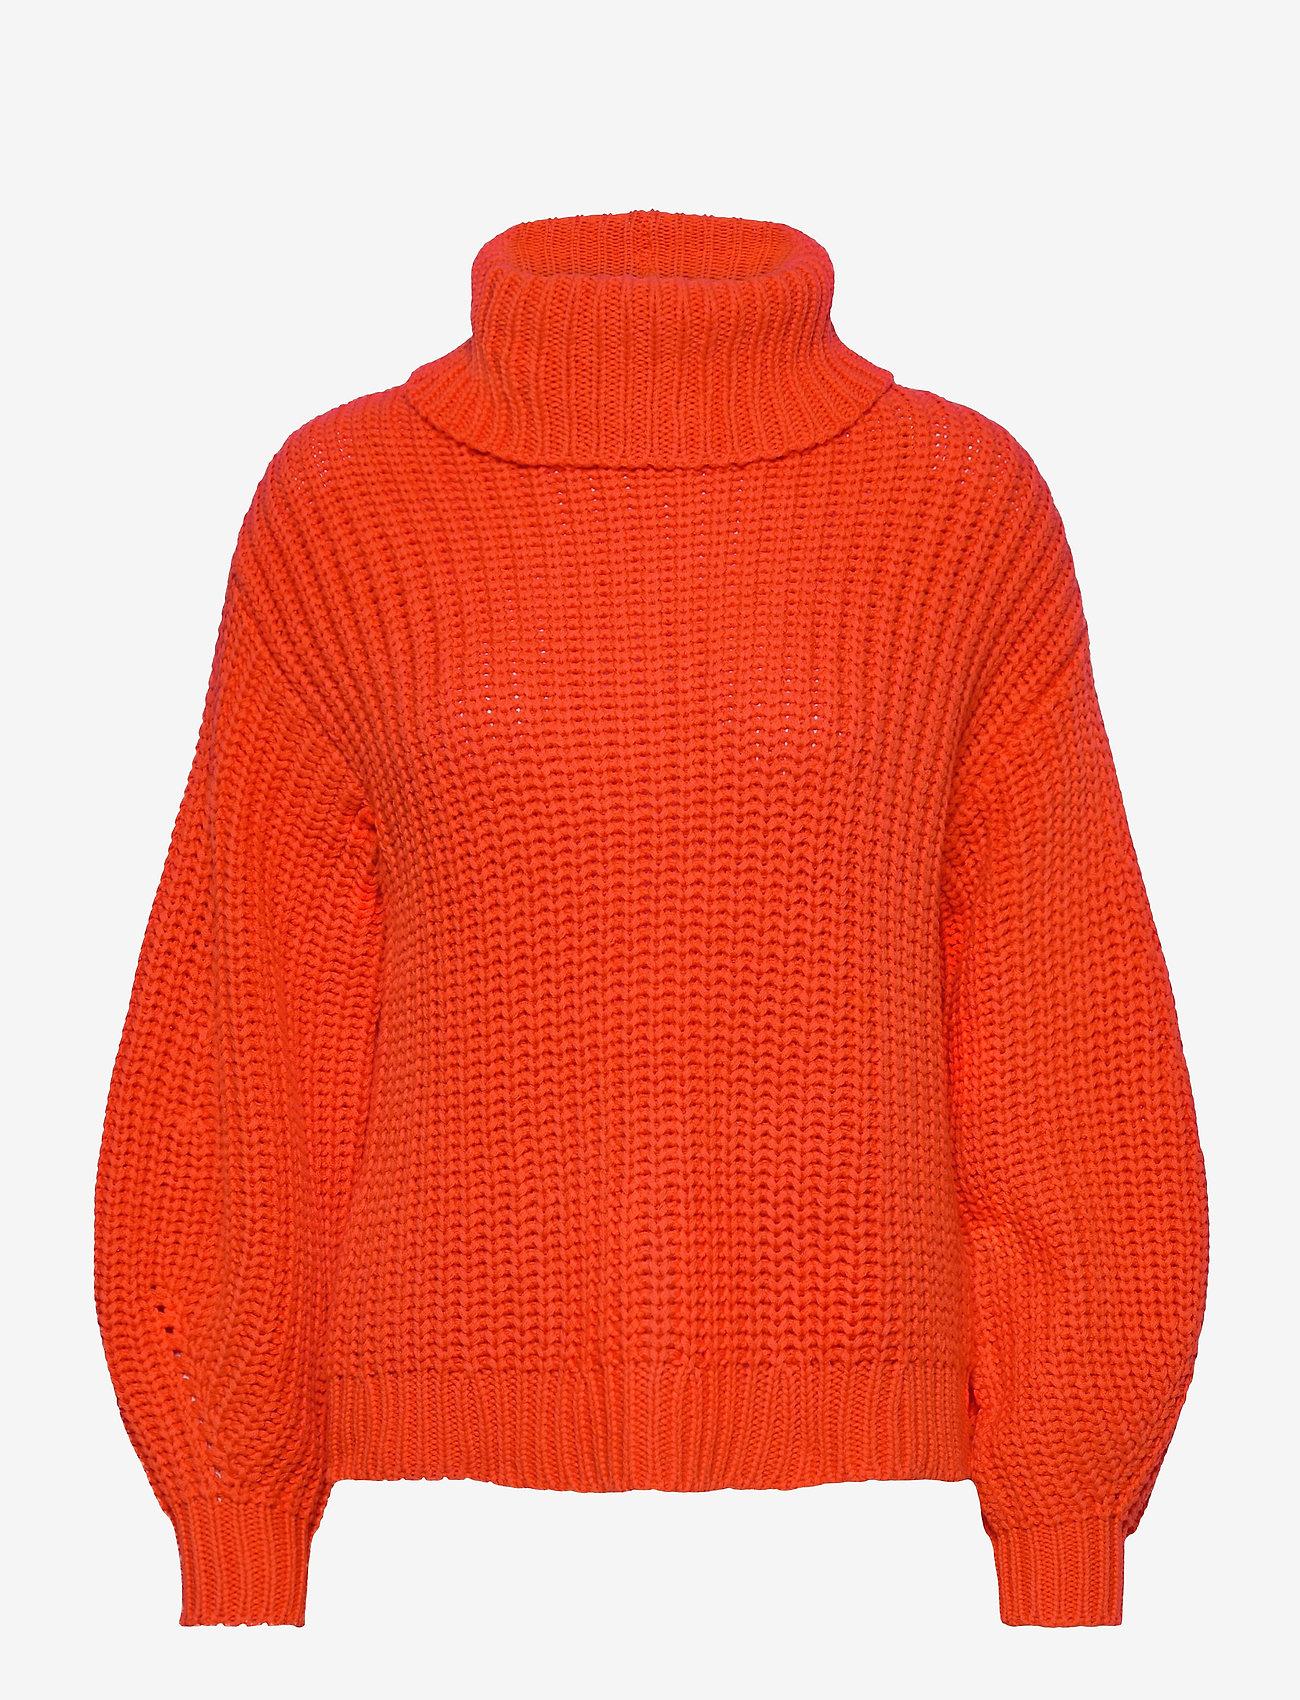 YAS - YASORANGINA LS KNIT ROLL NECK PULLOVER - turtlenecks - orange.com - 0